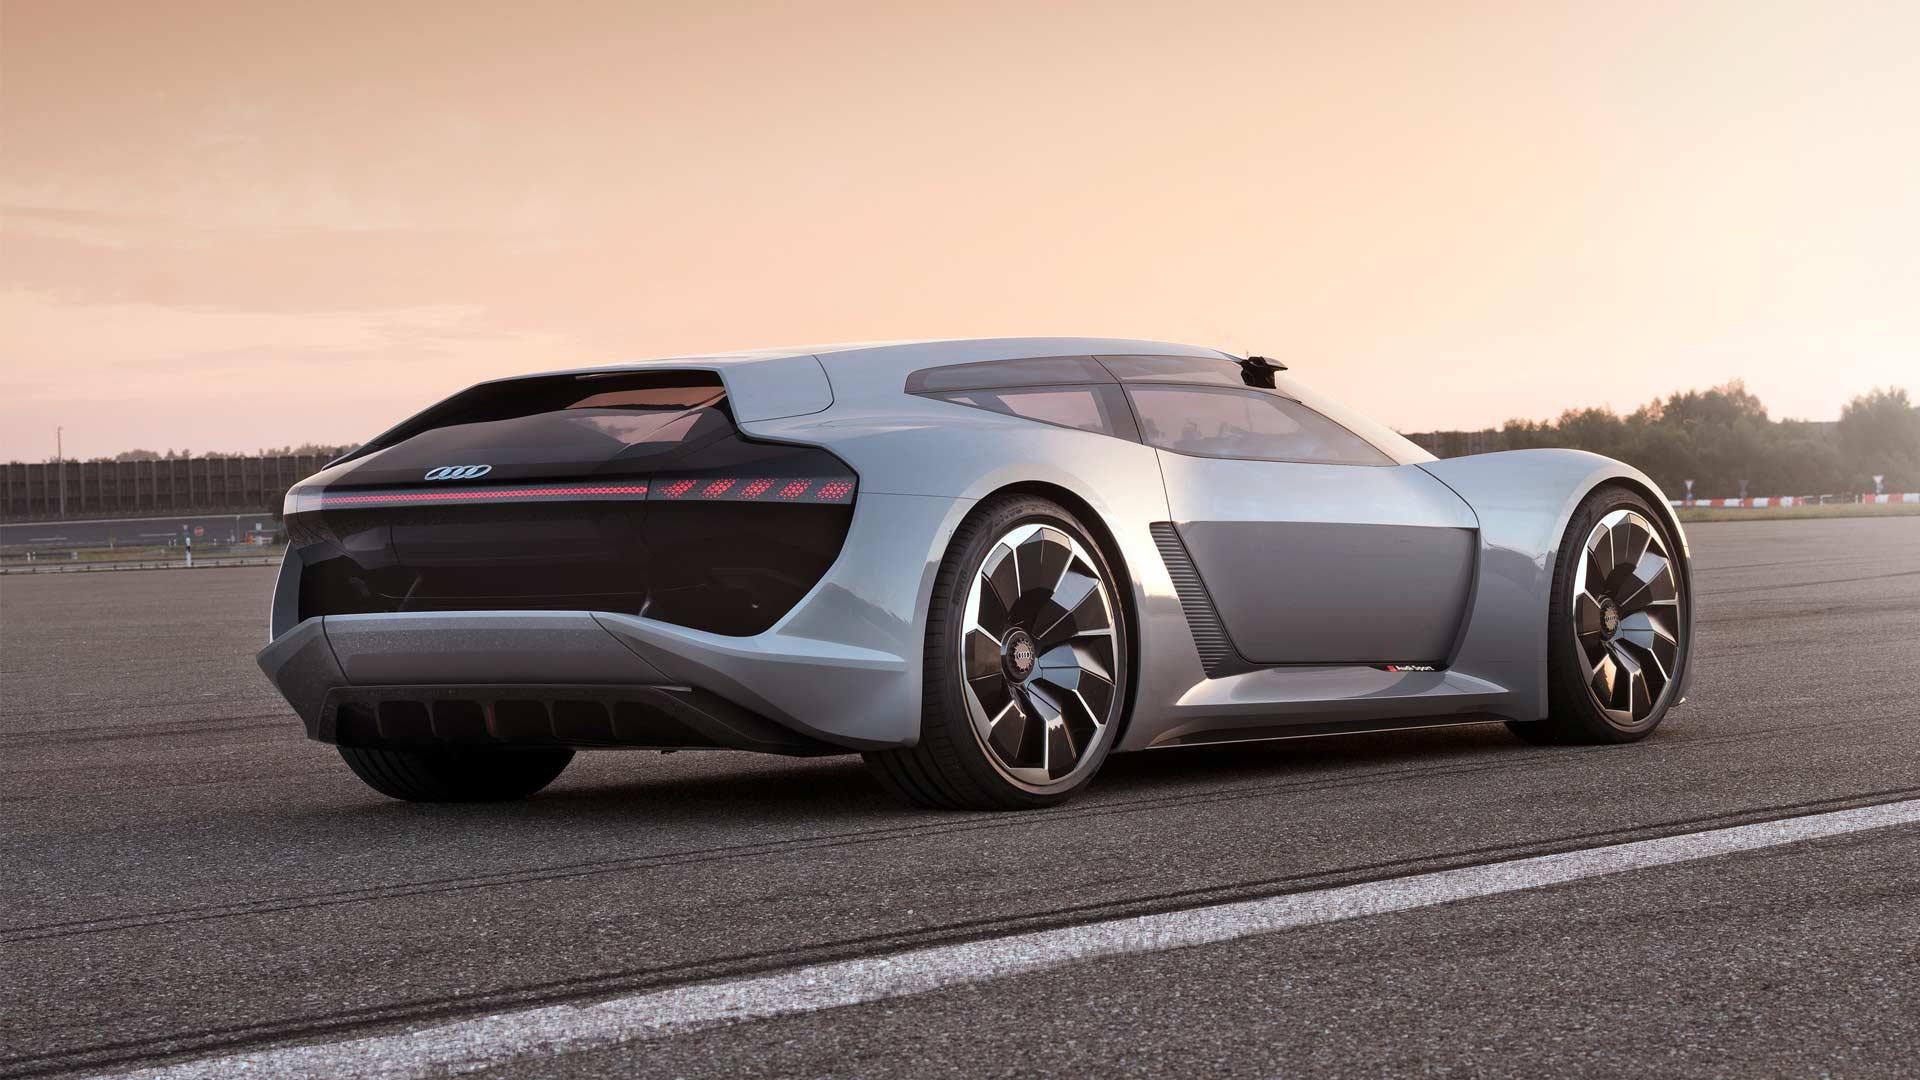 Audi-PB18-e-tron-concept_2